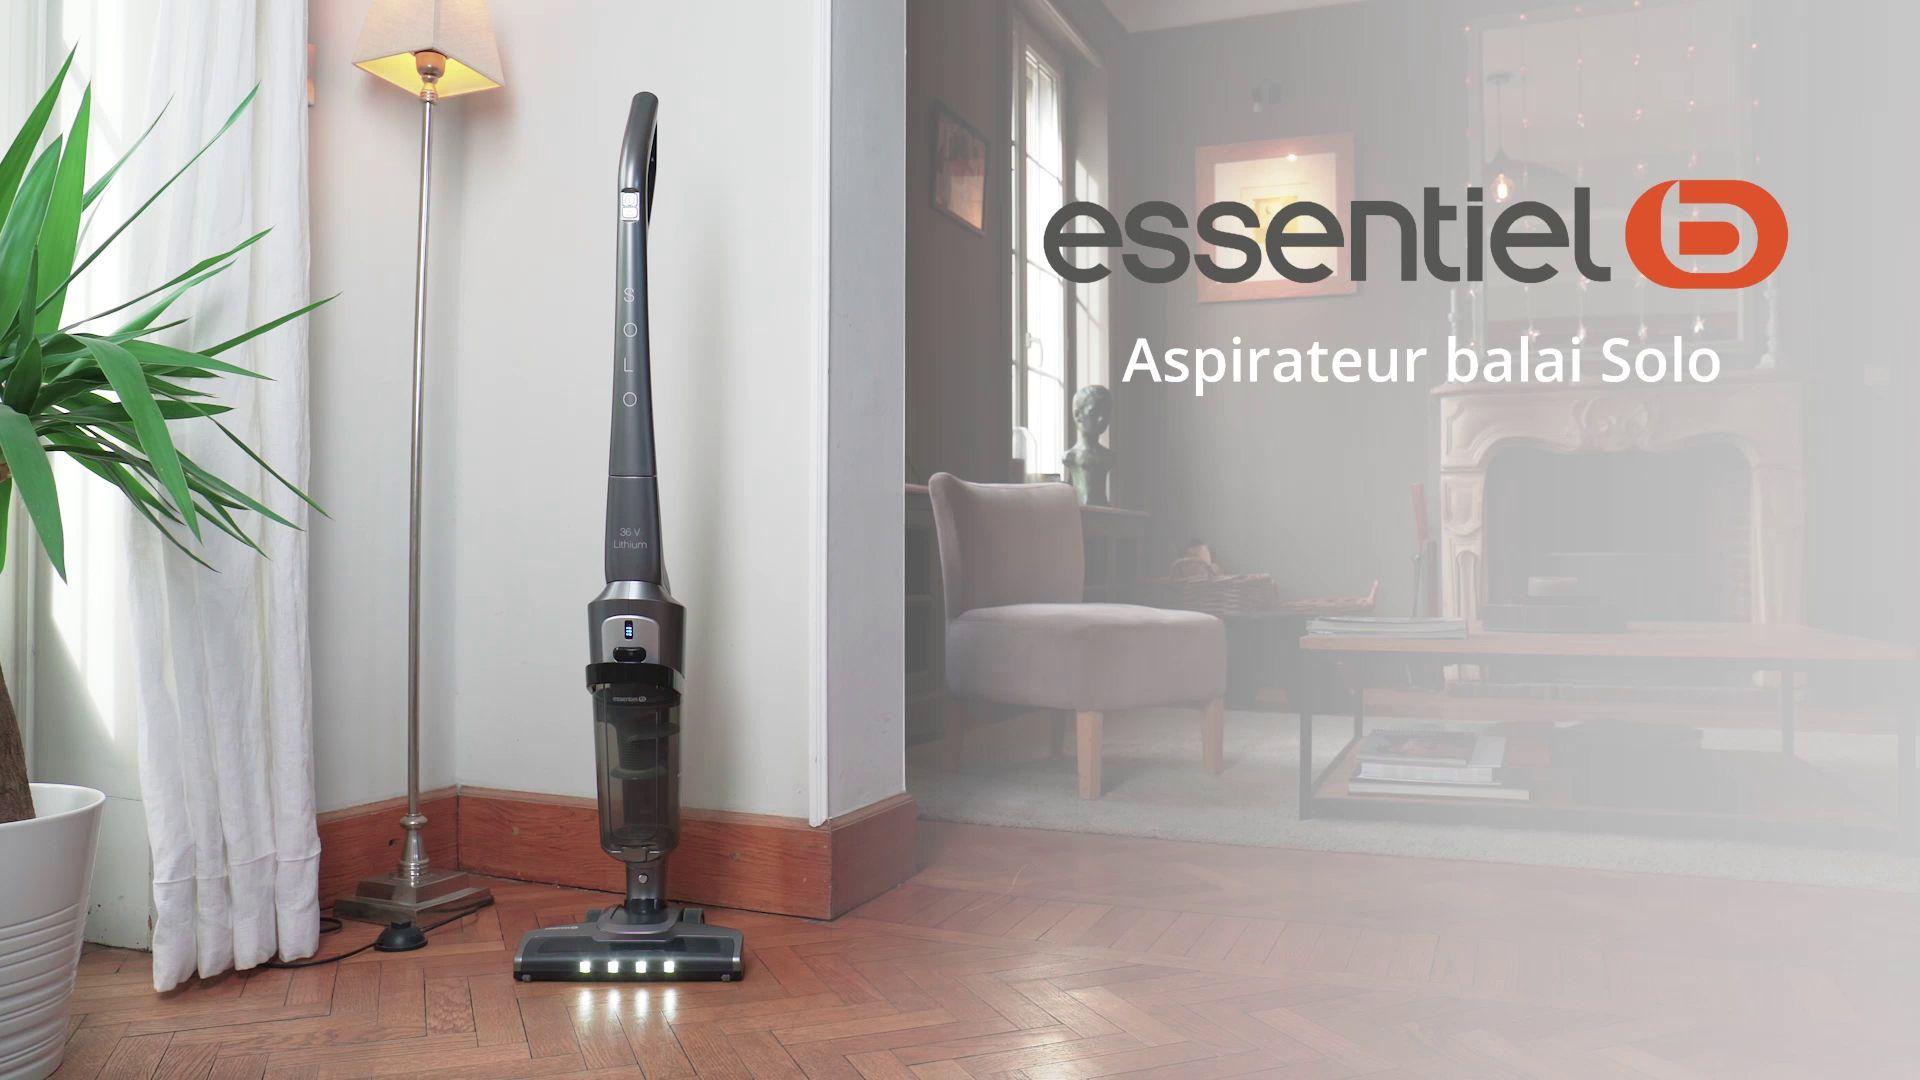 Essentielb EAMO 360 SOLO Aspirateur balai | Boulanger